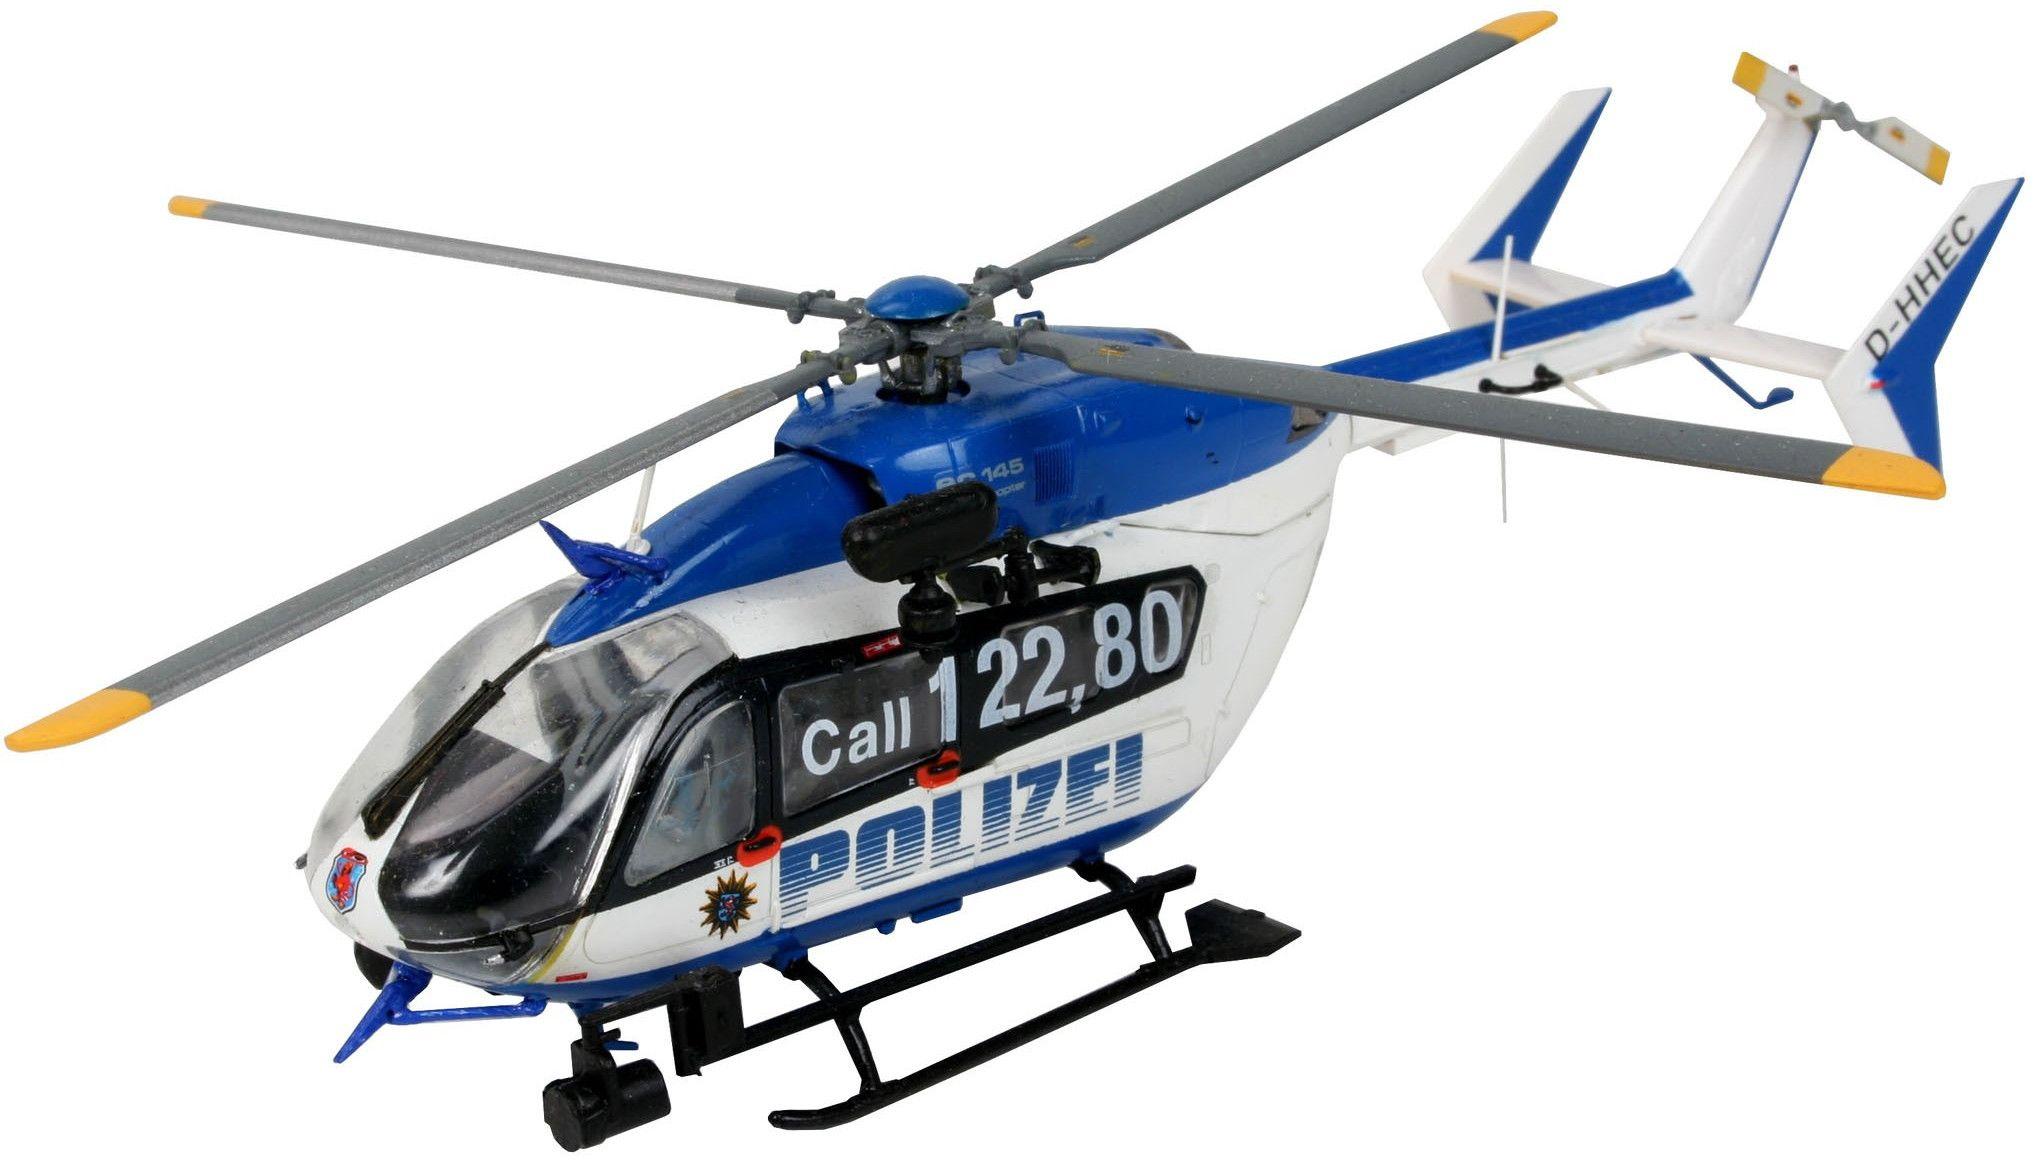 Сглобяем модел на полицейски хеликоптер Revell Eurocopter - EC145 Police/Gendarmerie (04653) - 1